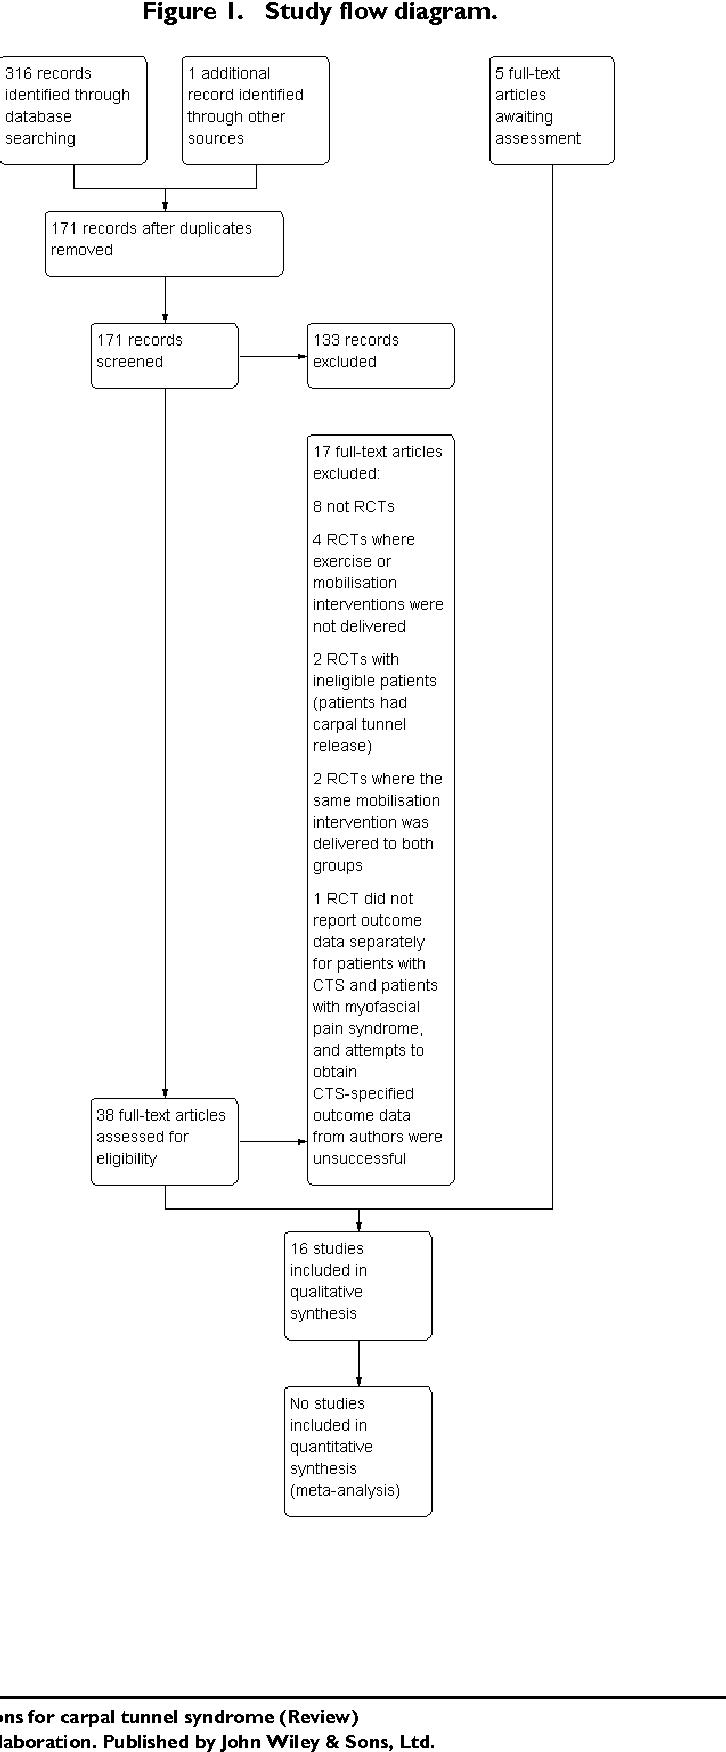 Figure 1. Study flow diagram.